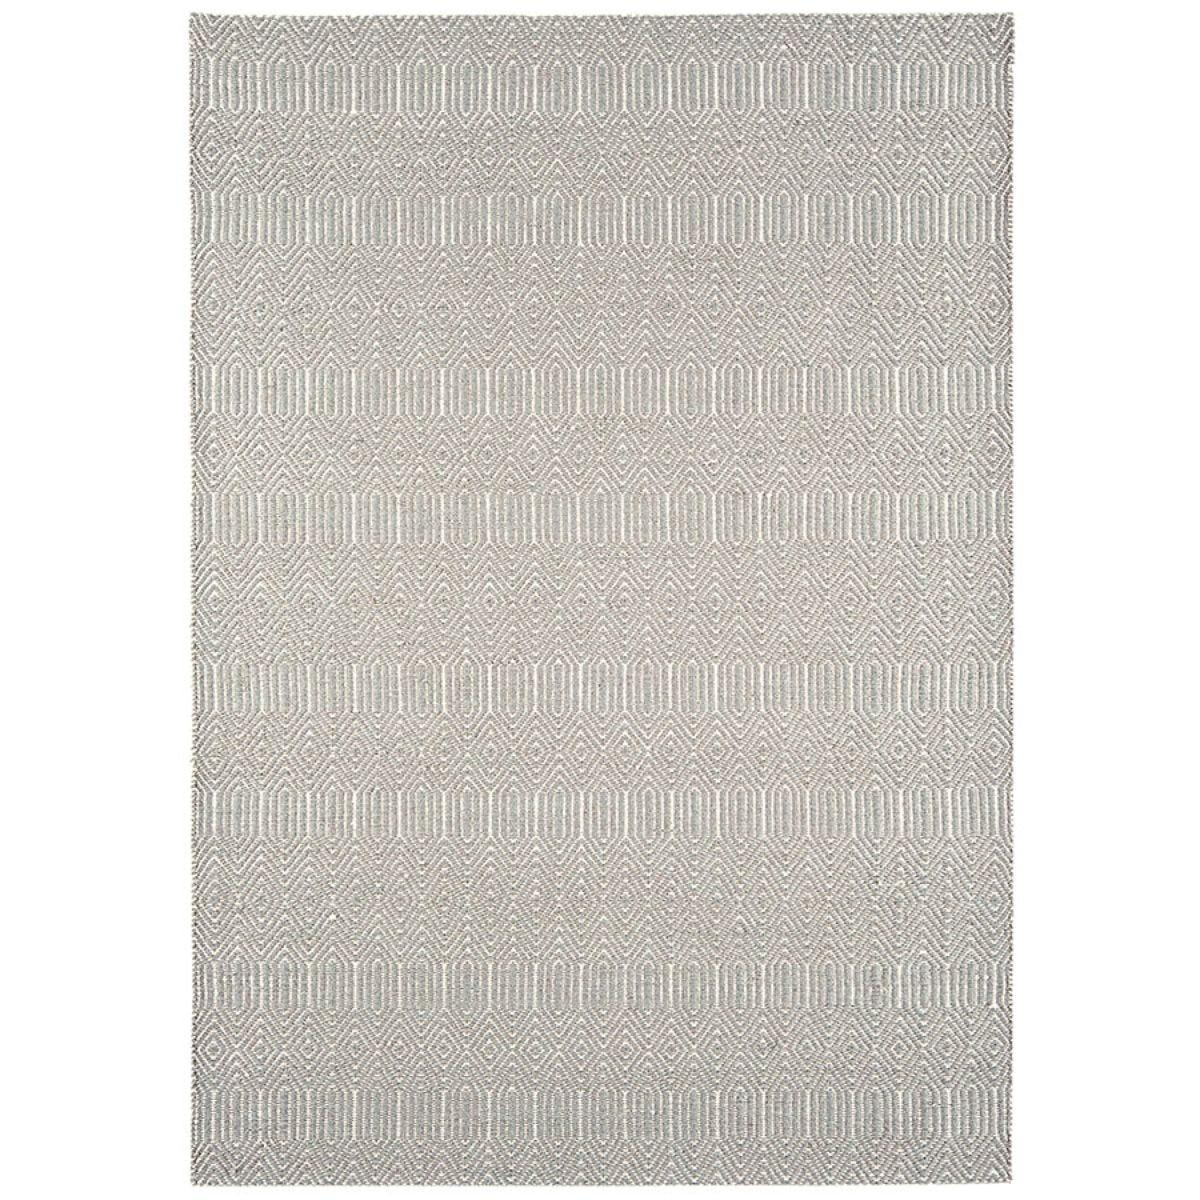 Asiatic Sloan Rug, 100 x 150cm - Silver